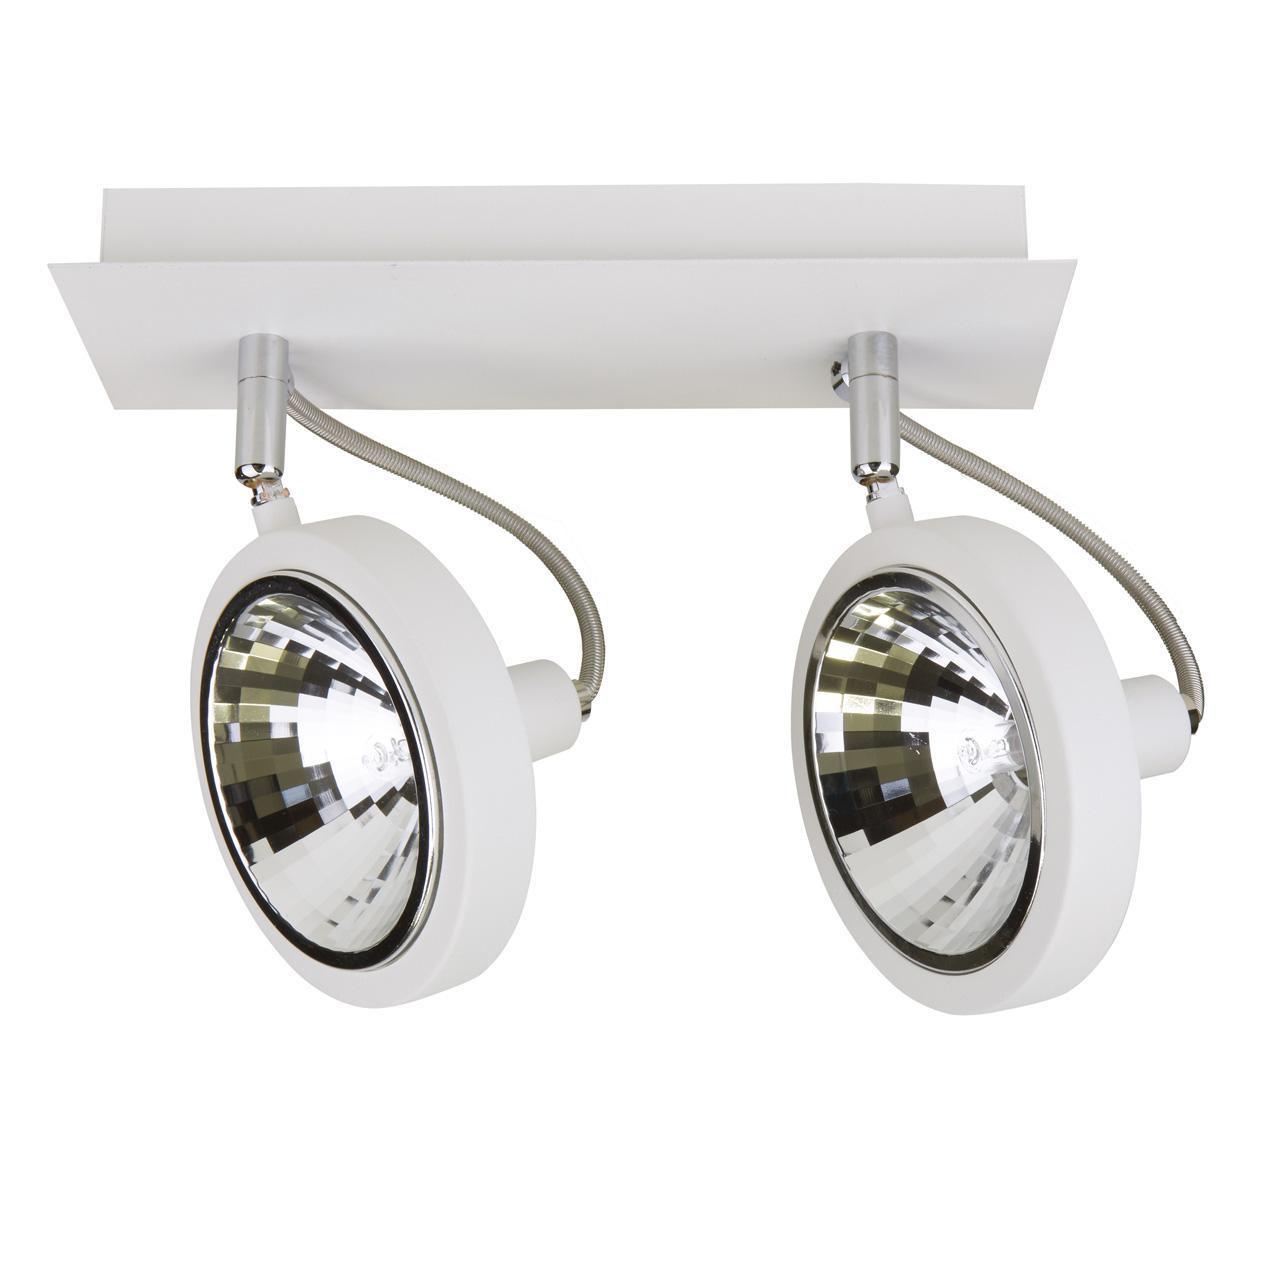 Фото - Потолочный светильник Lightstar 210326, белый спот lightstar varieta 9 210326